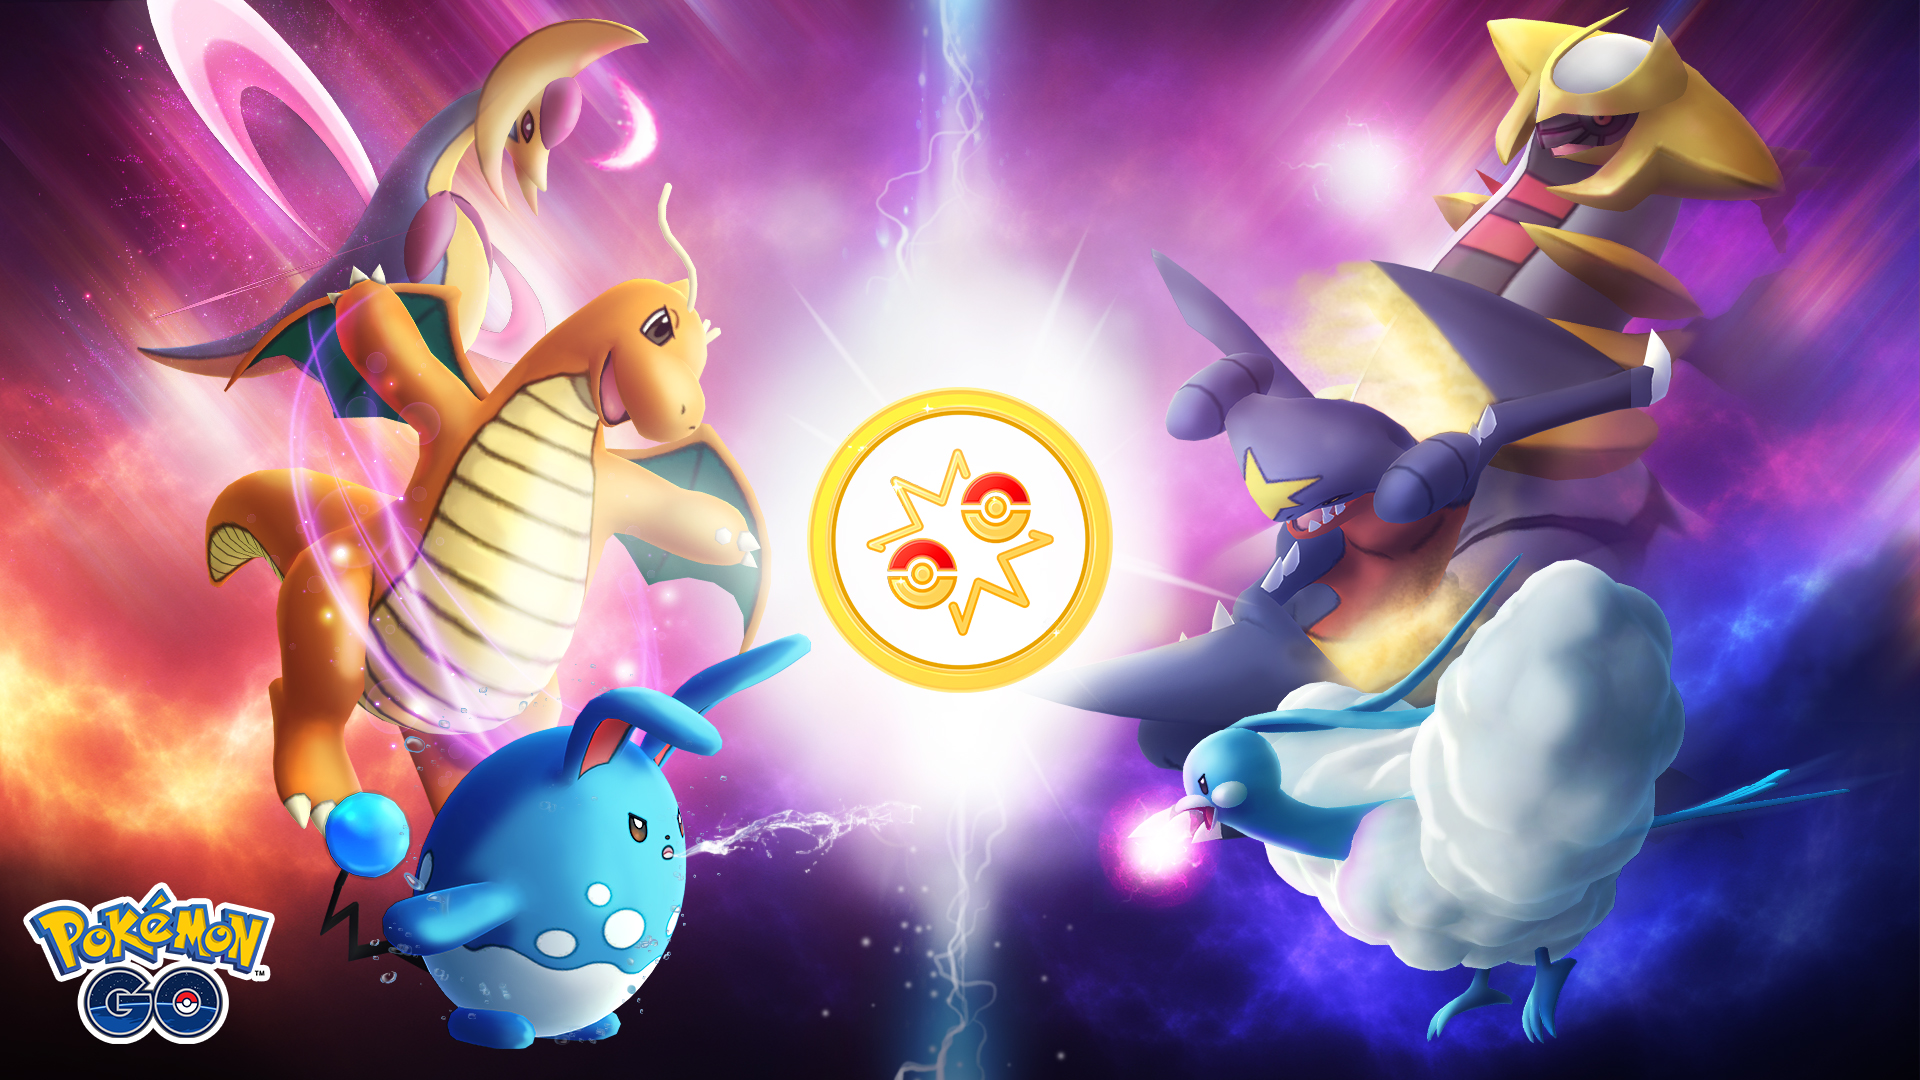 Pokemon Go Battle Raid Announcement December 2020